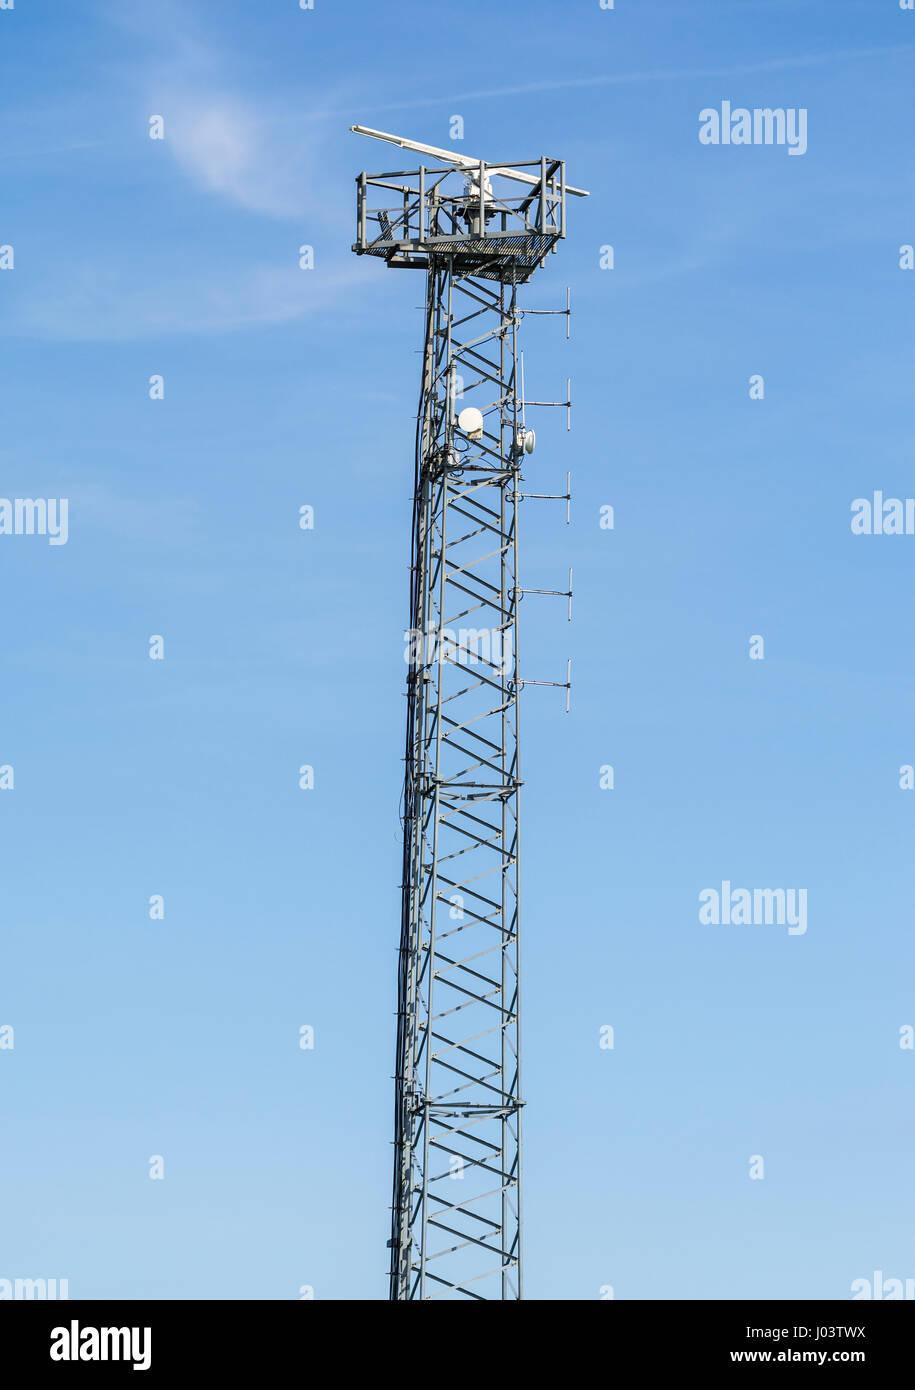 Radar sensor on land on top of a tall metal mast. - Stock Image